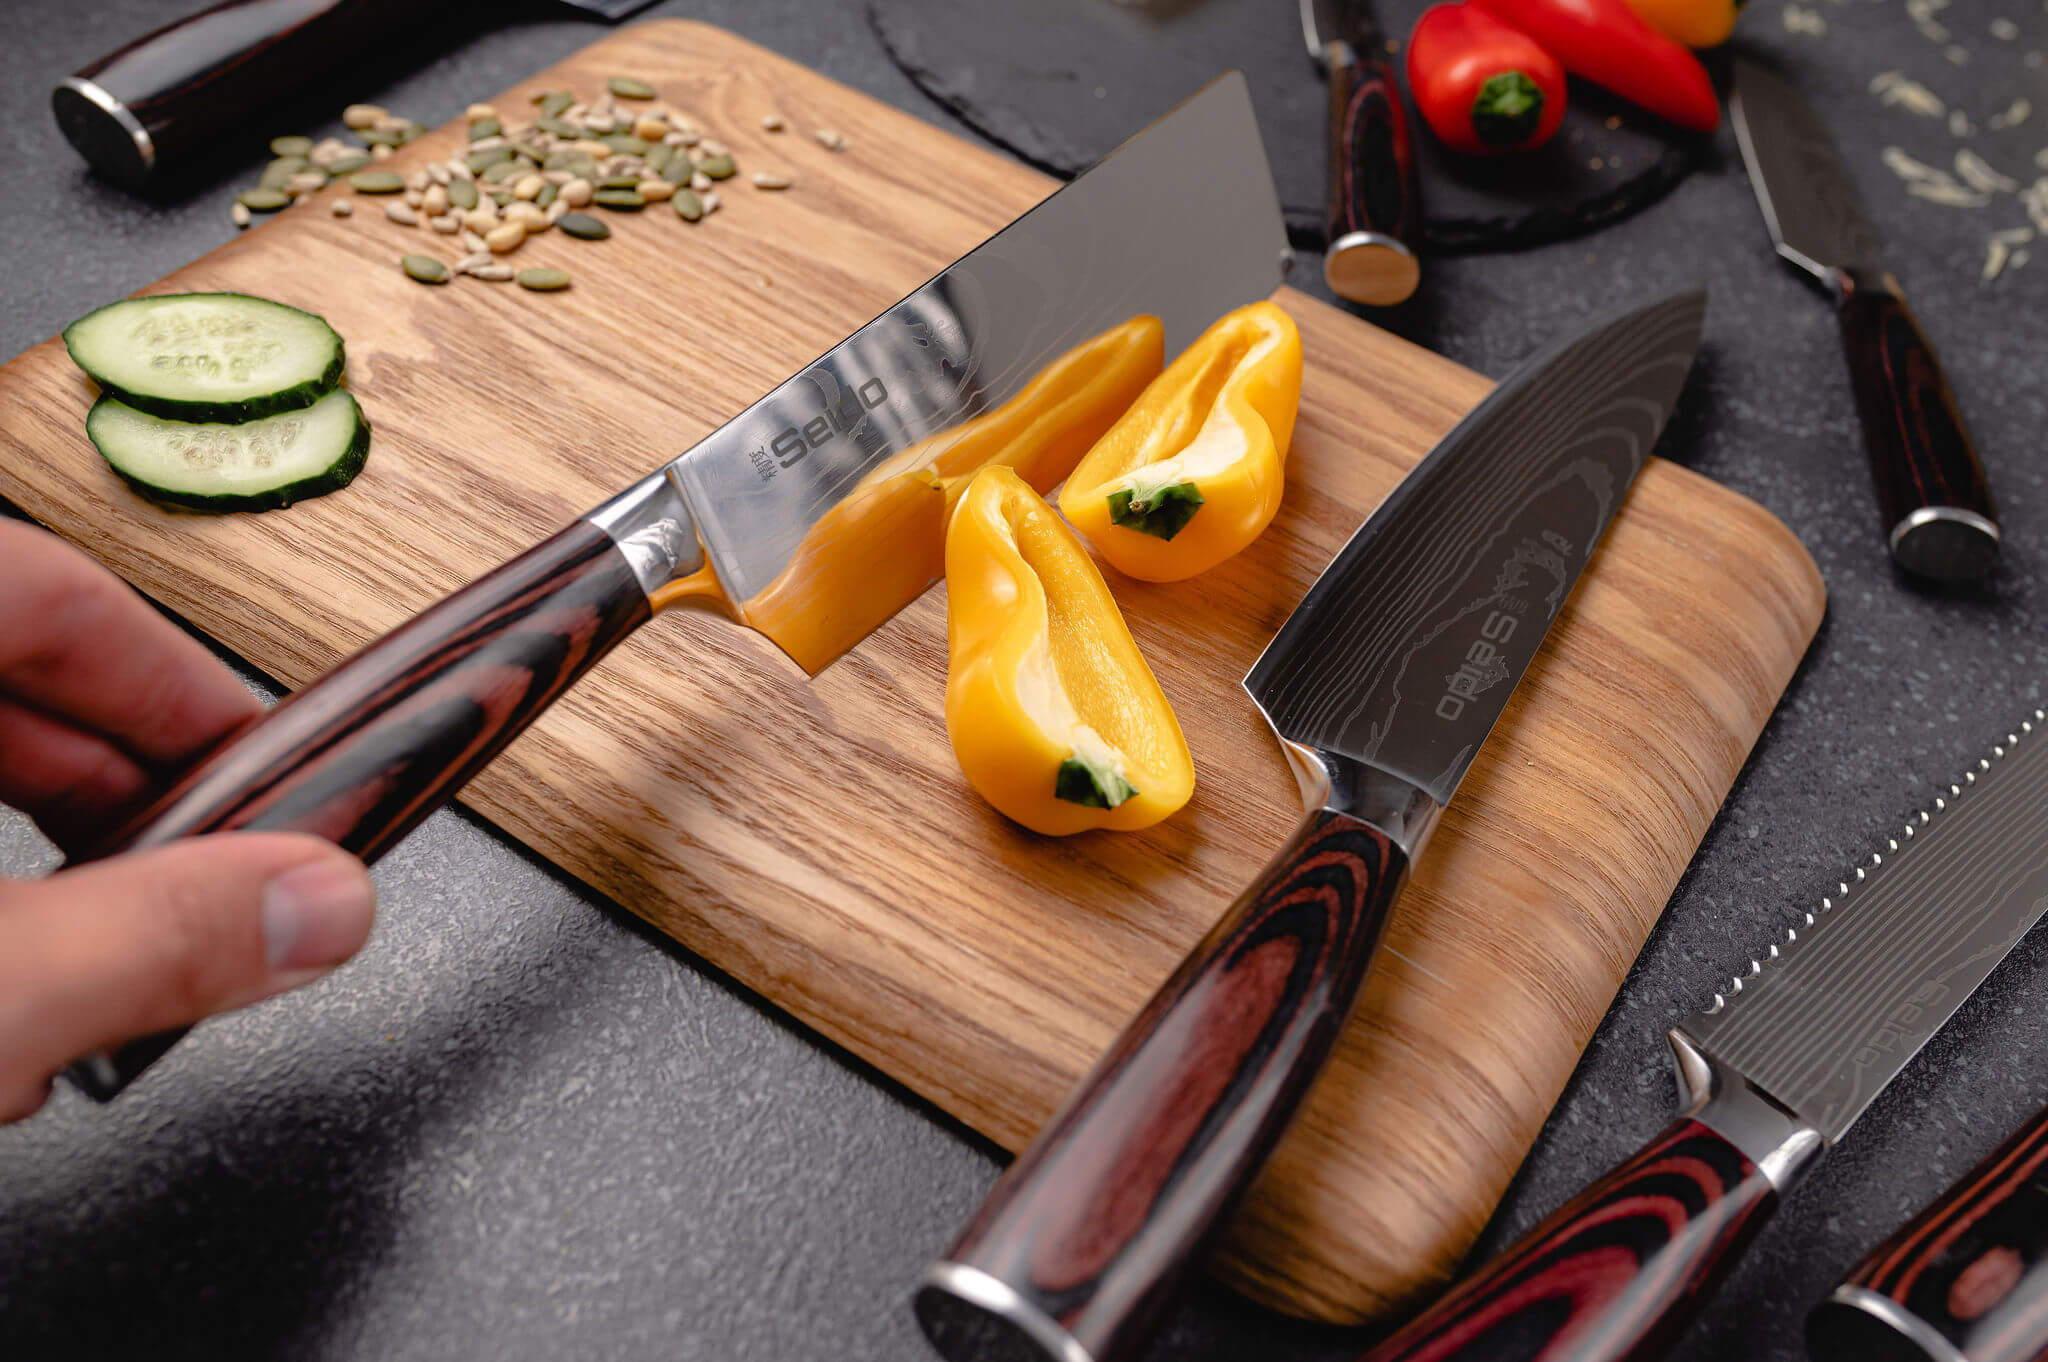 Seido japanese kitchen Chef knife cutting meat